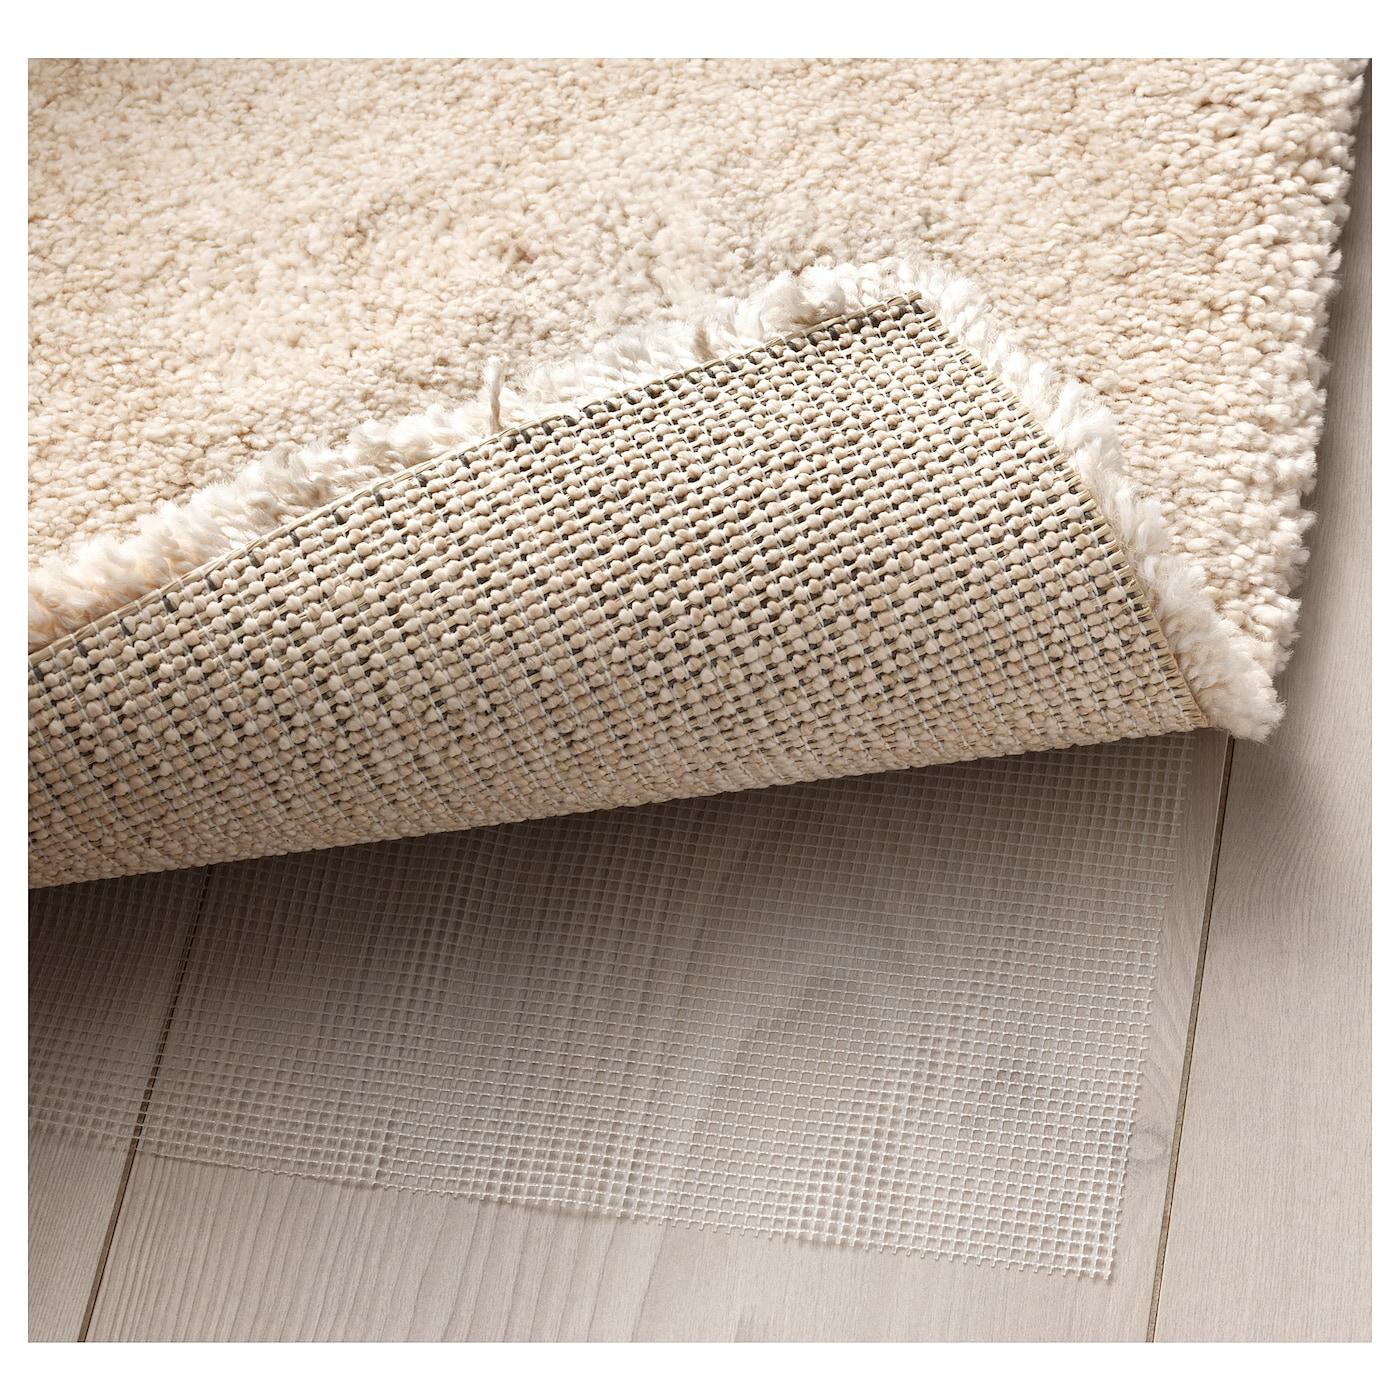 STOENSE Rug, Low Pile Off-white 80 X 150 Cm